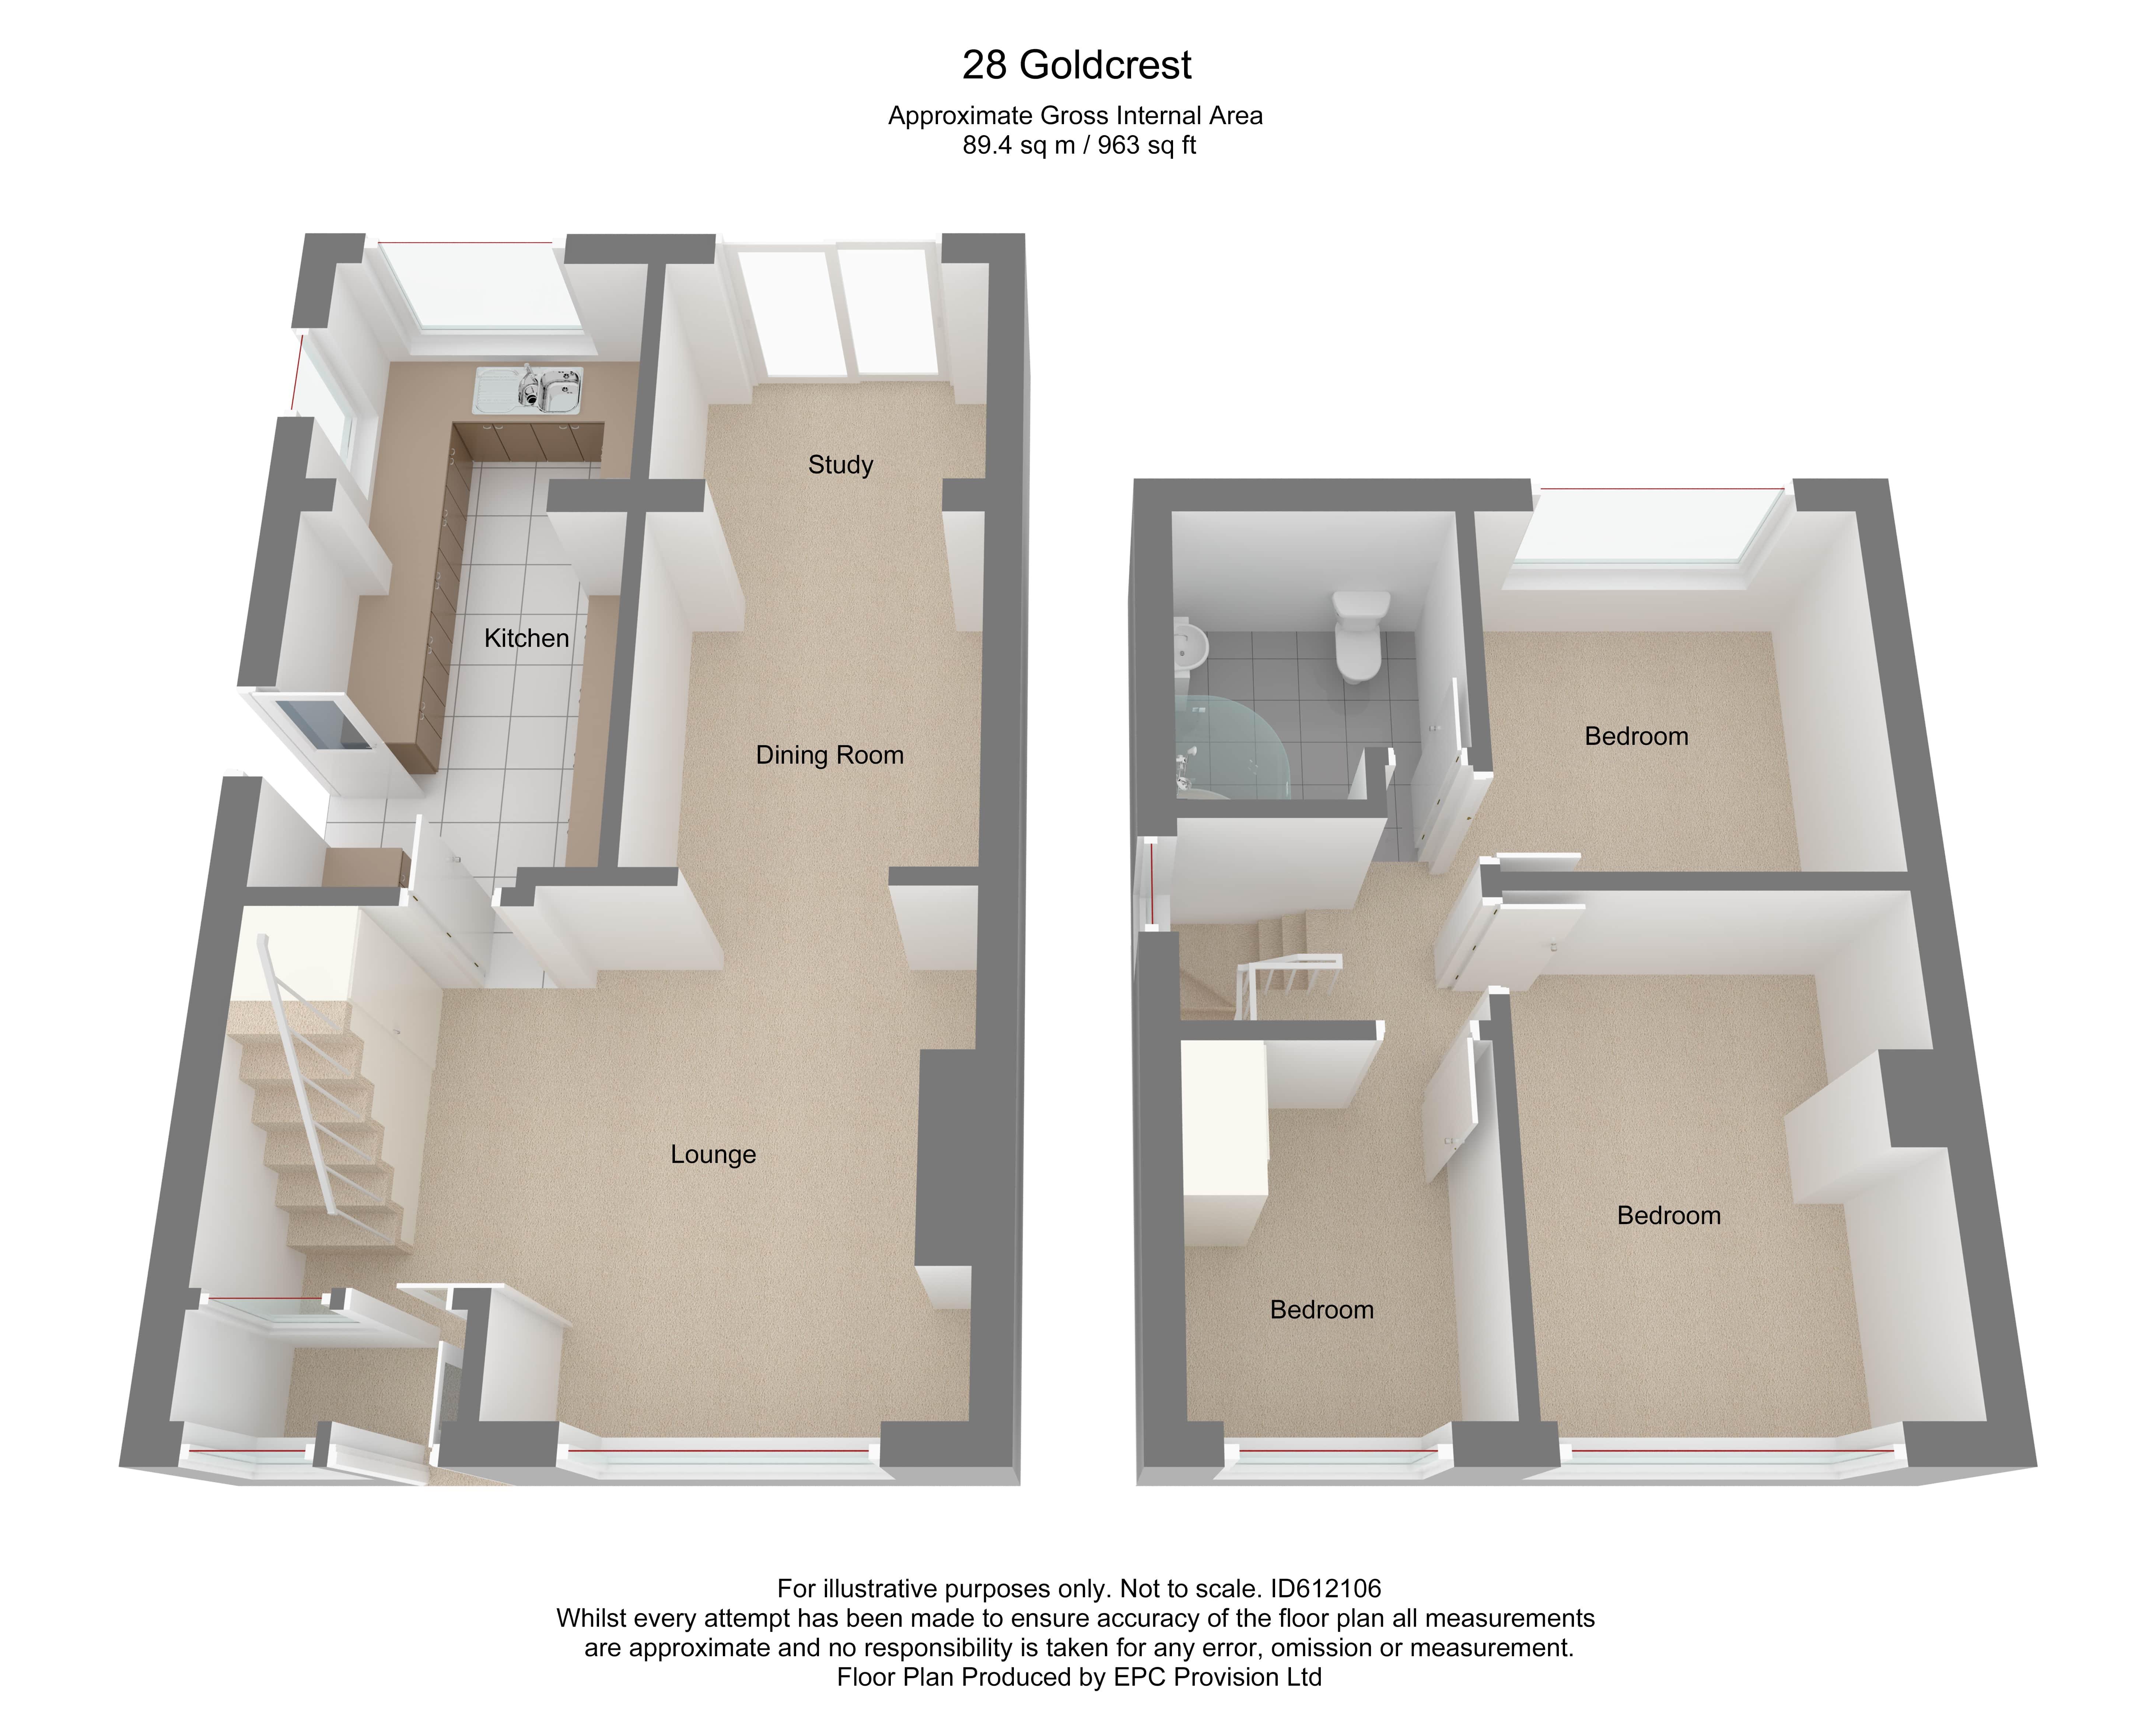 Floorplan for Goldcrest Road, Chipping Sodbury.